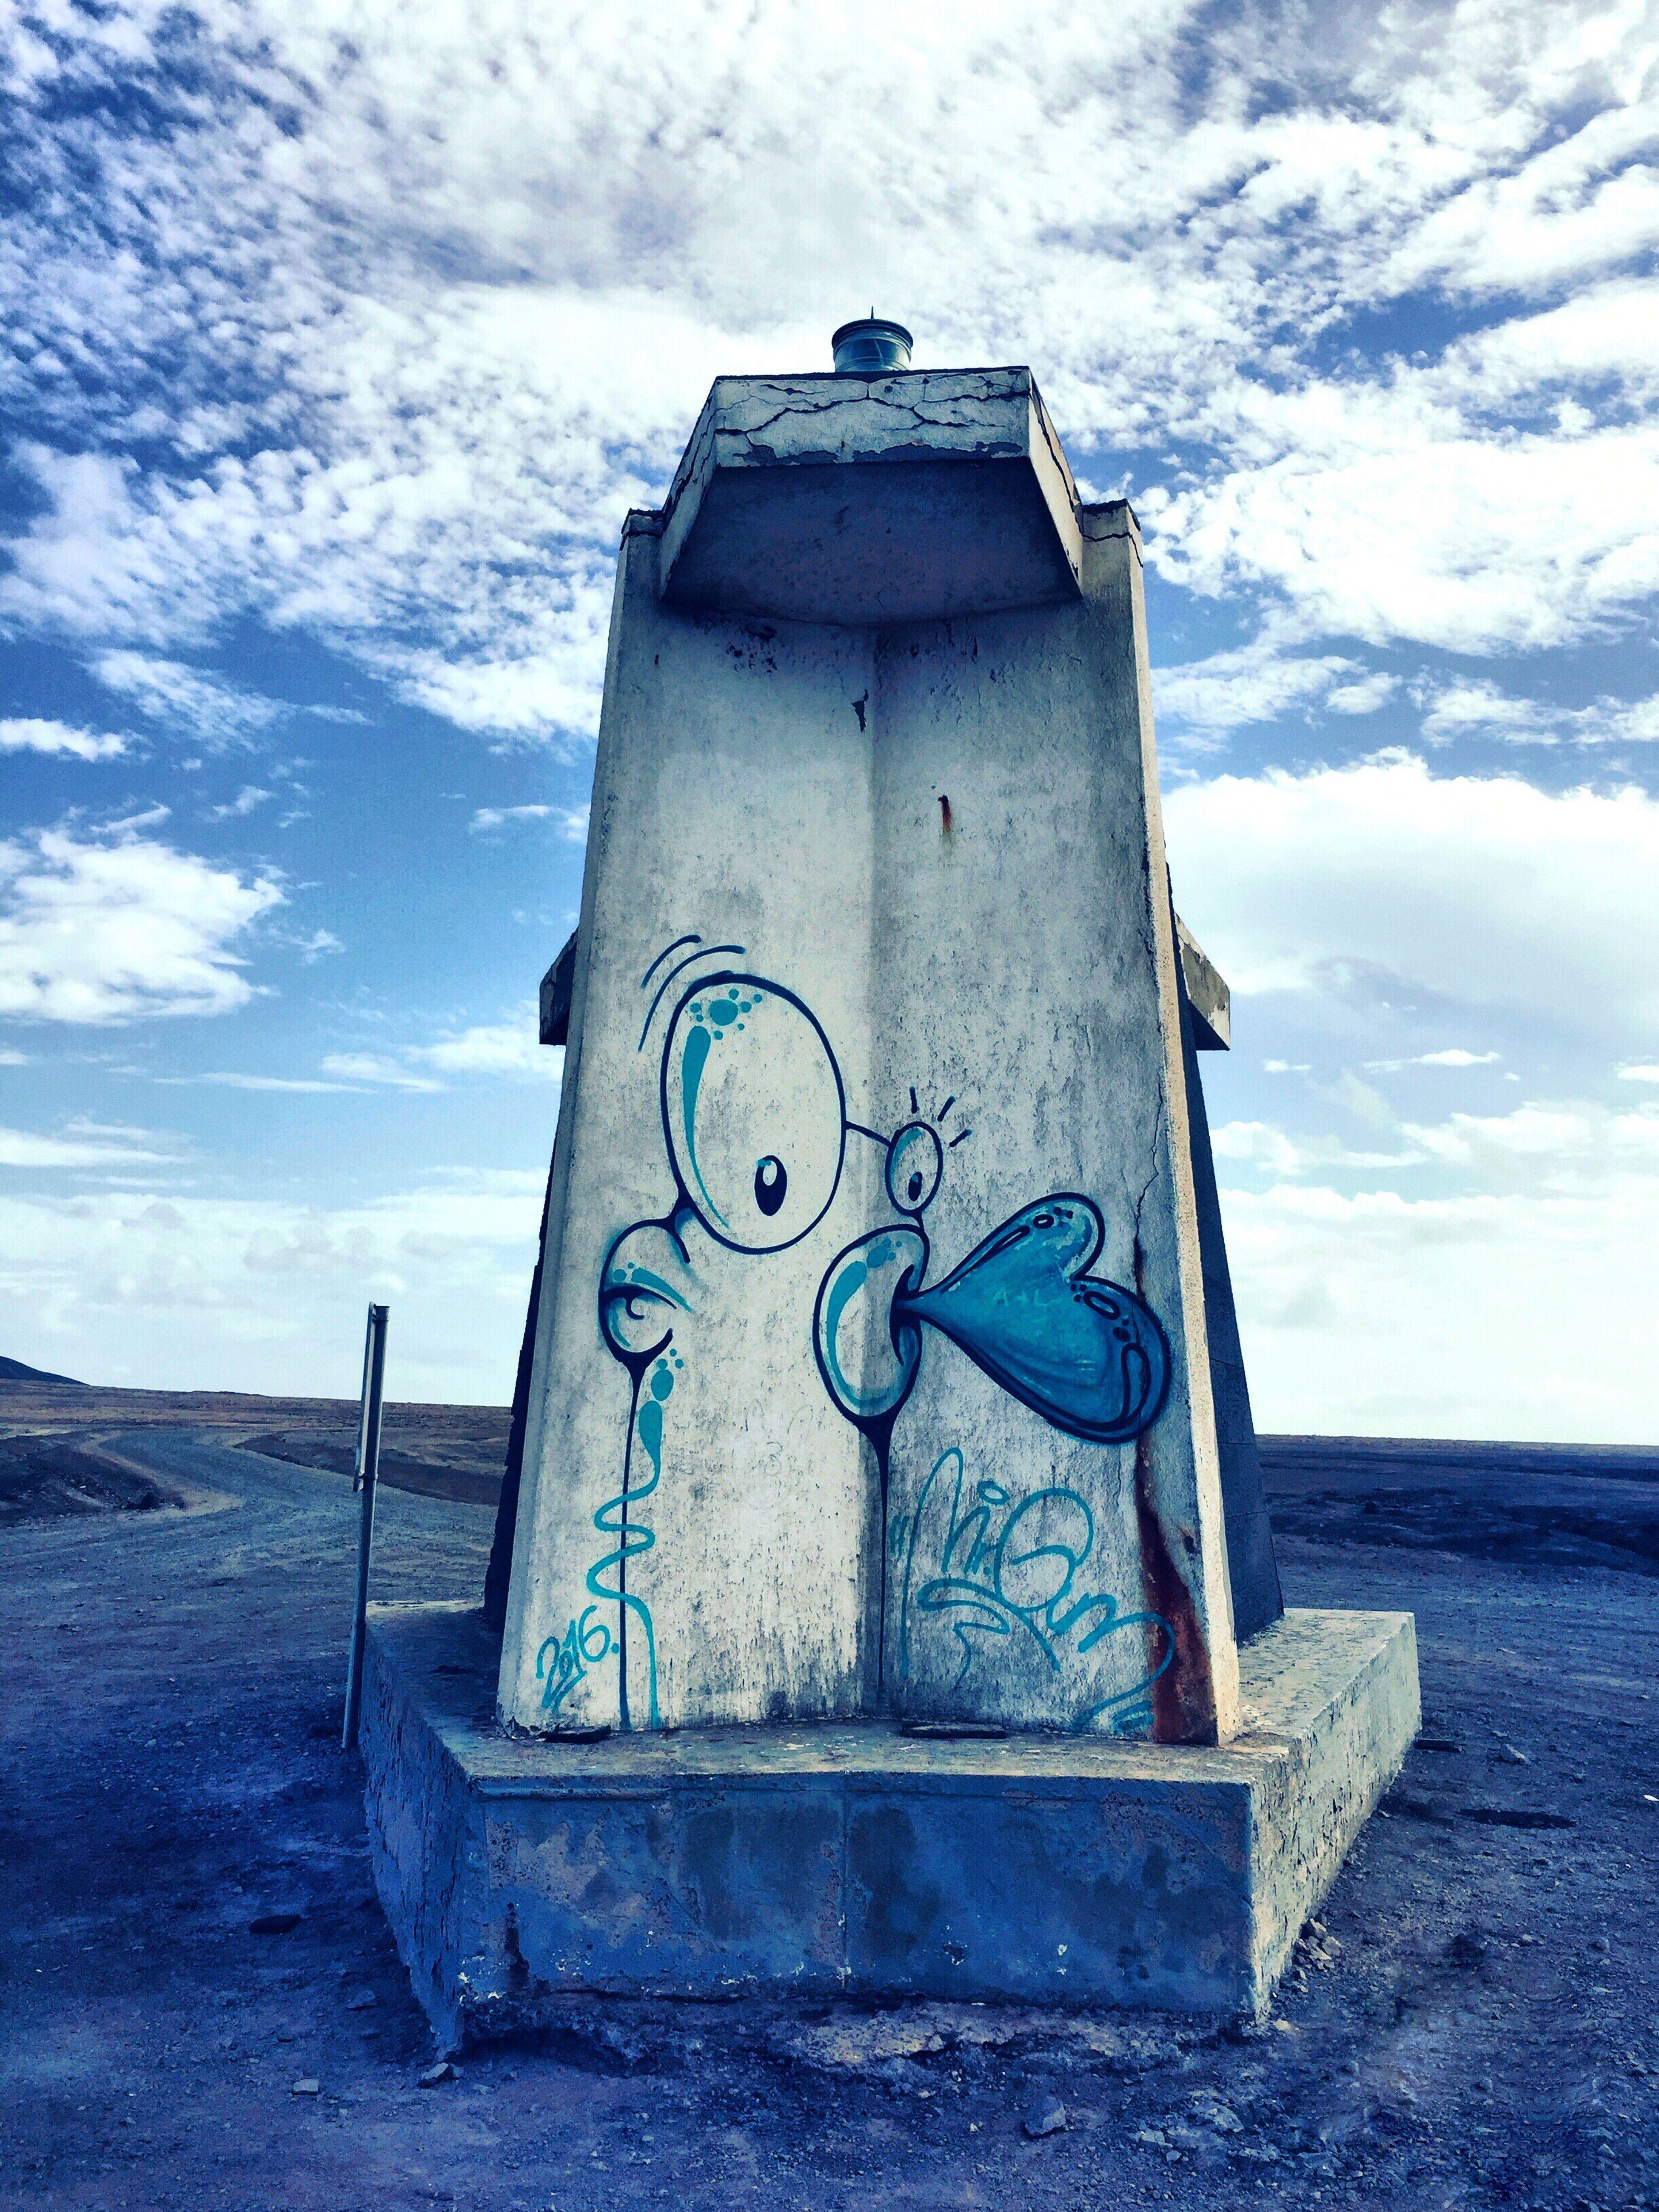 Fuerteventura Fuerte Fuerteventuraexperience Monument South South Of Fuerte Wüste  Canyons Canyon Graffiti Stone Change Your Perspective Blue Blue Sky Bluesky Cloudy